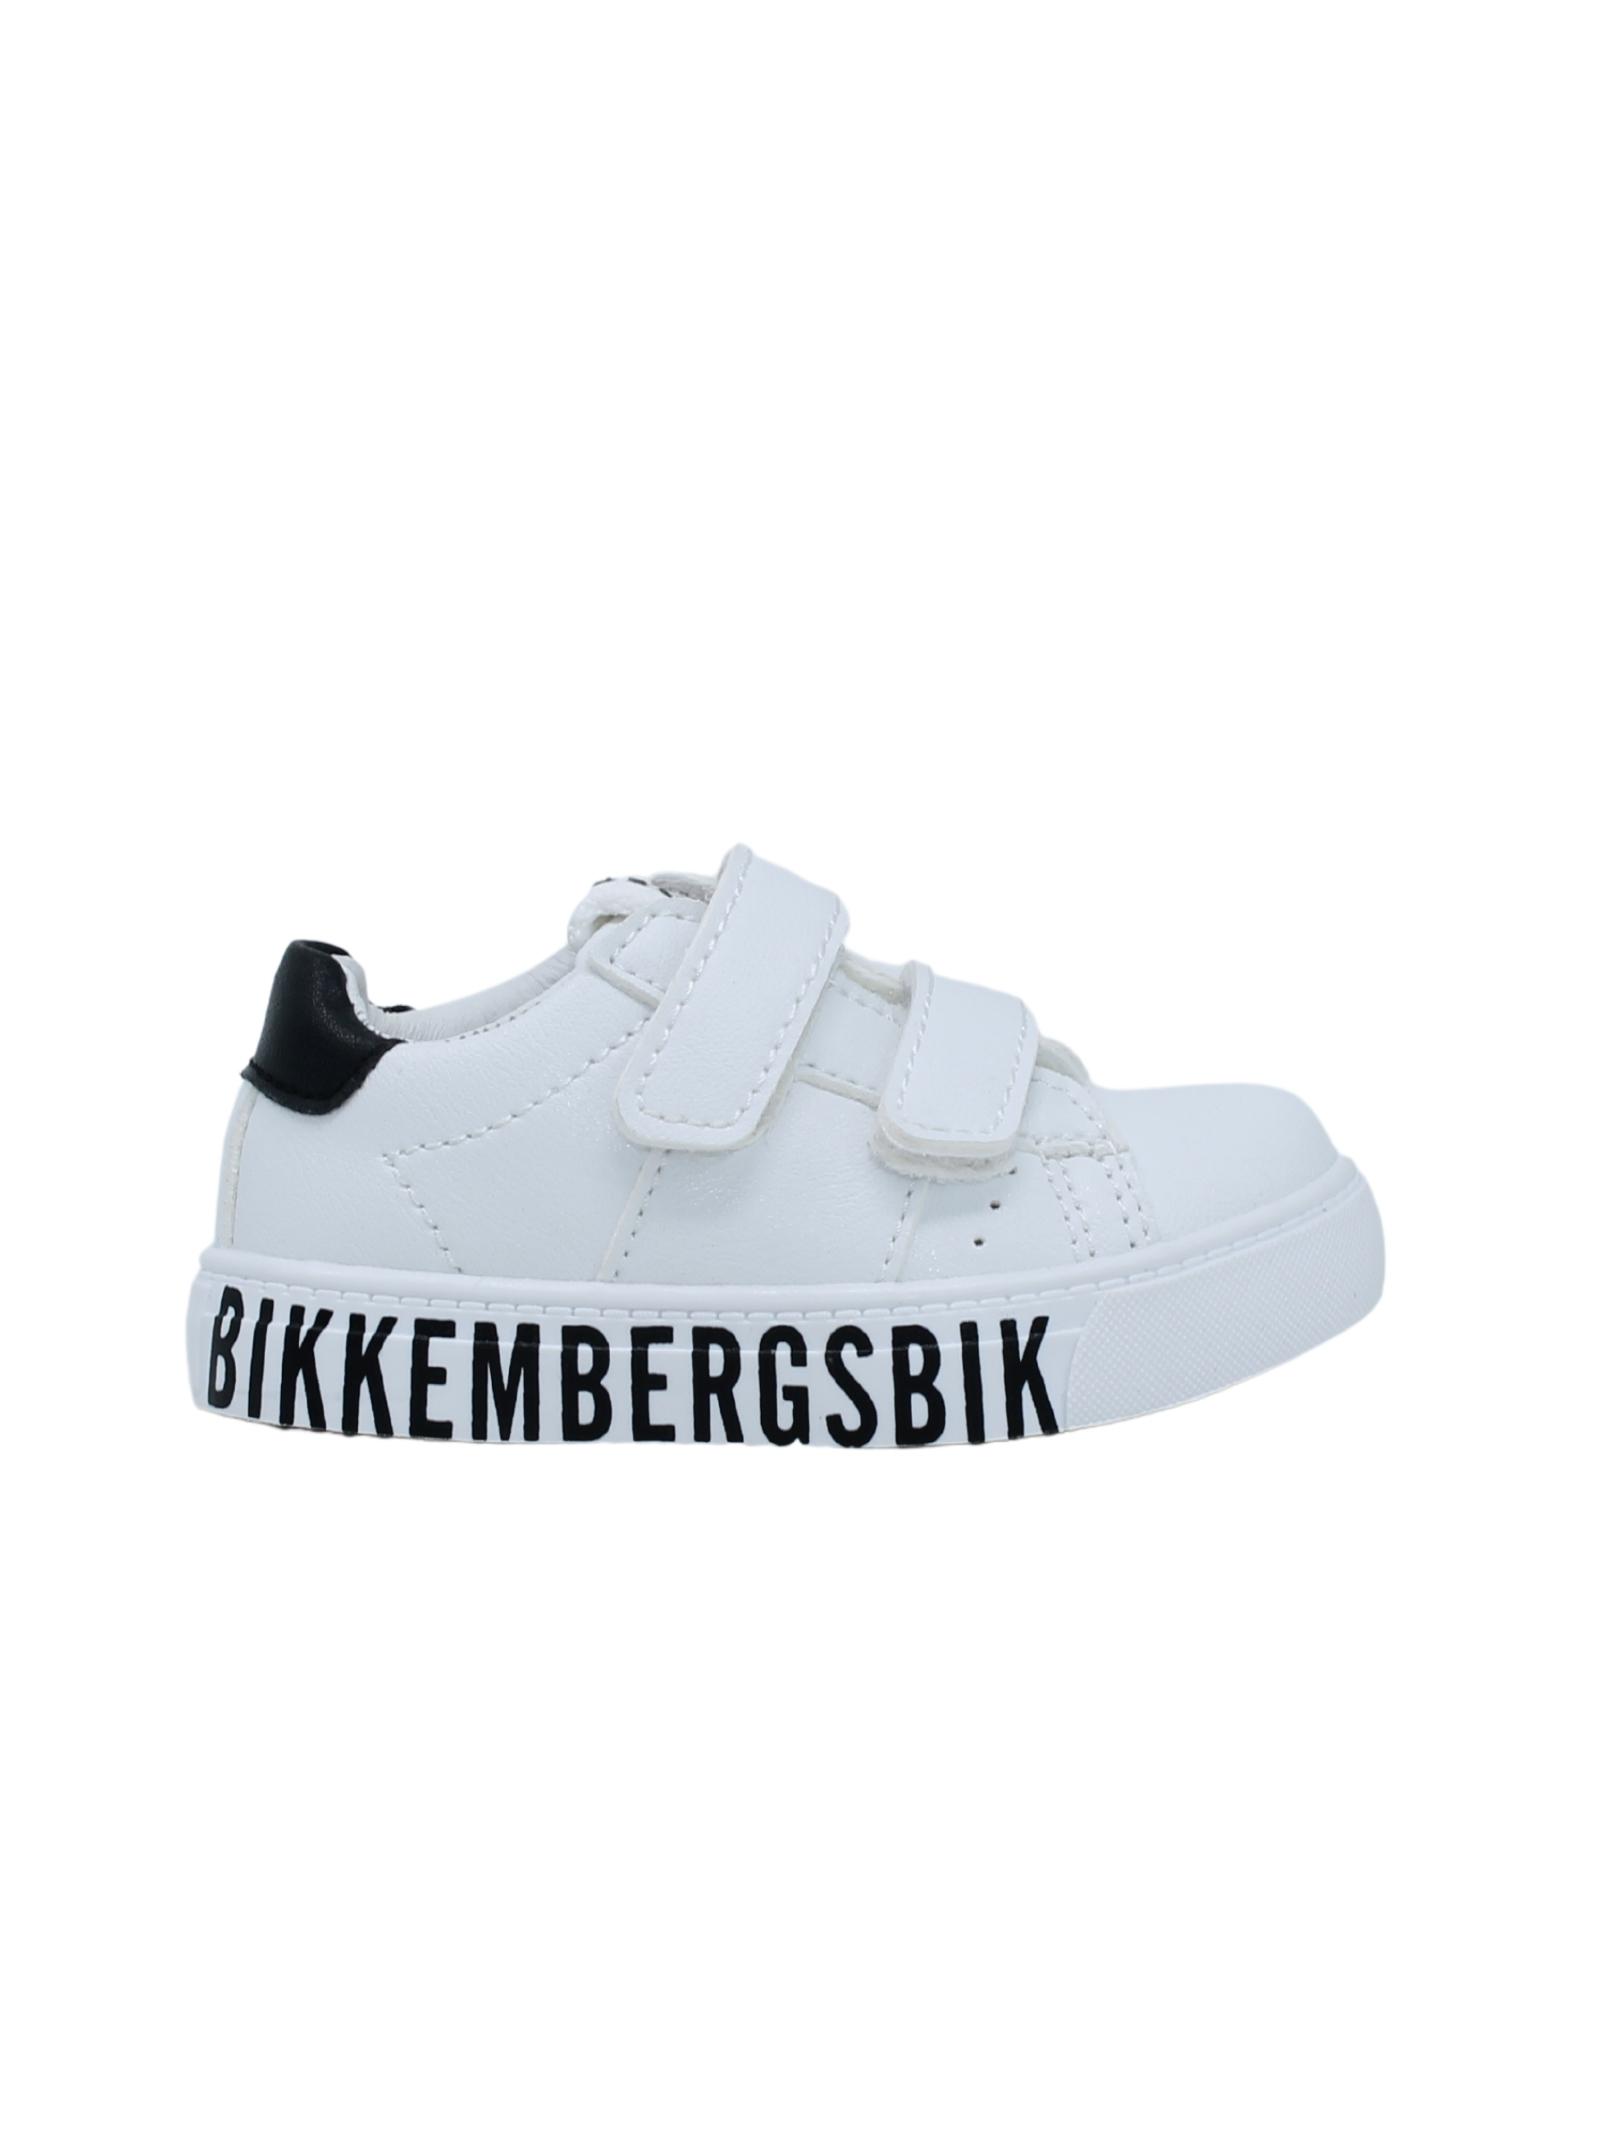 BIKKEMBERGS KIDS   Sneakers   K1B4205100193X002BIANCO